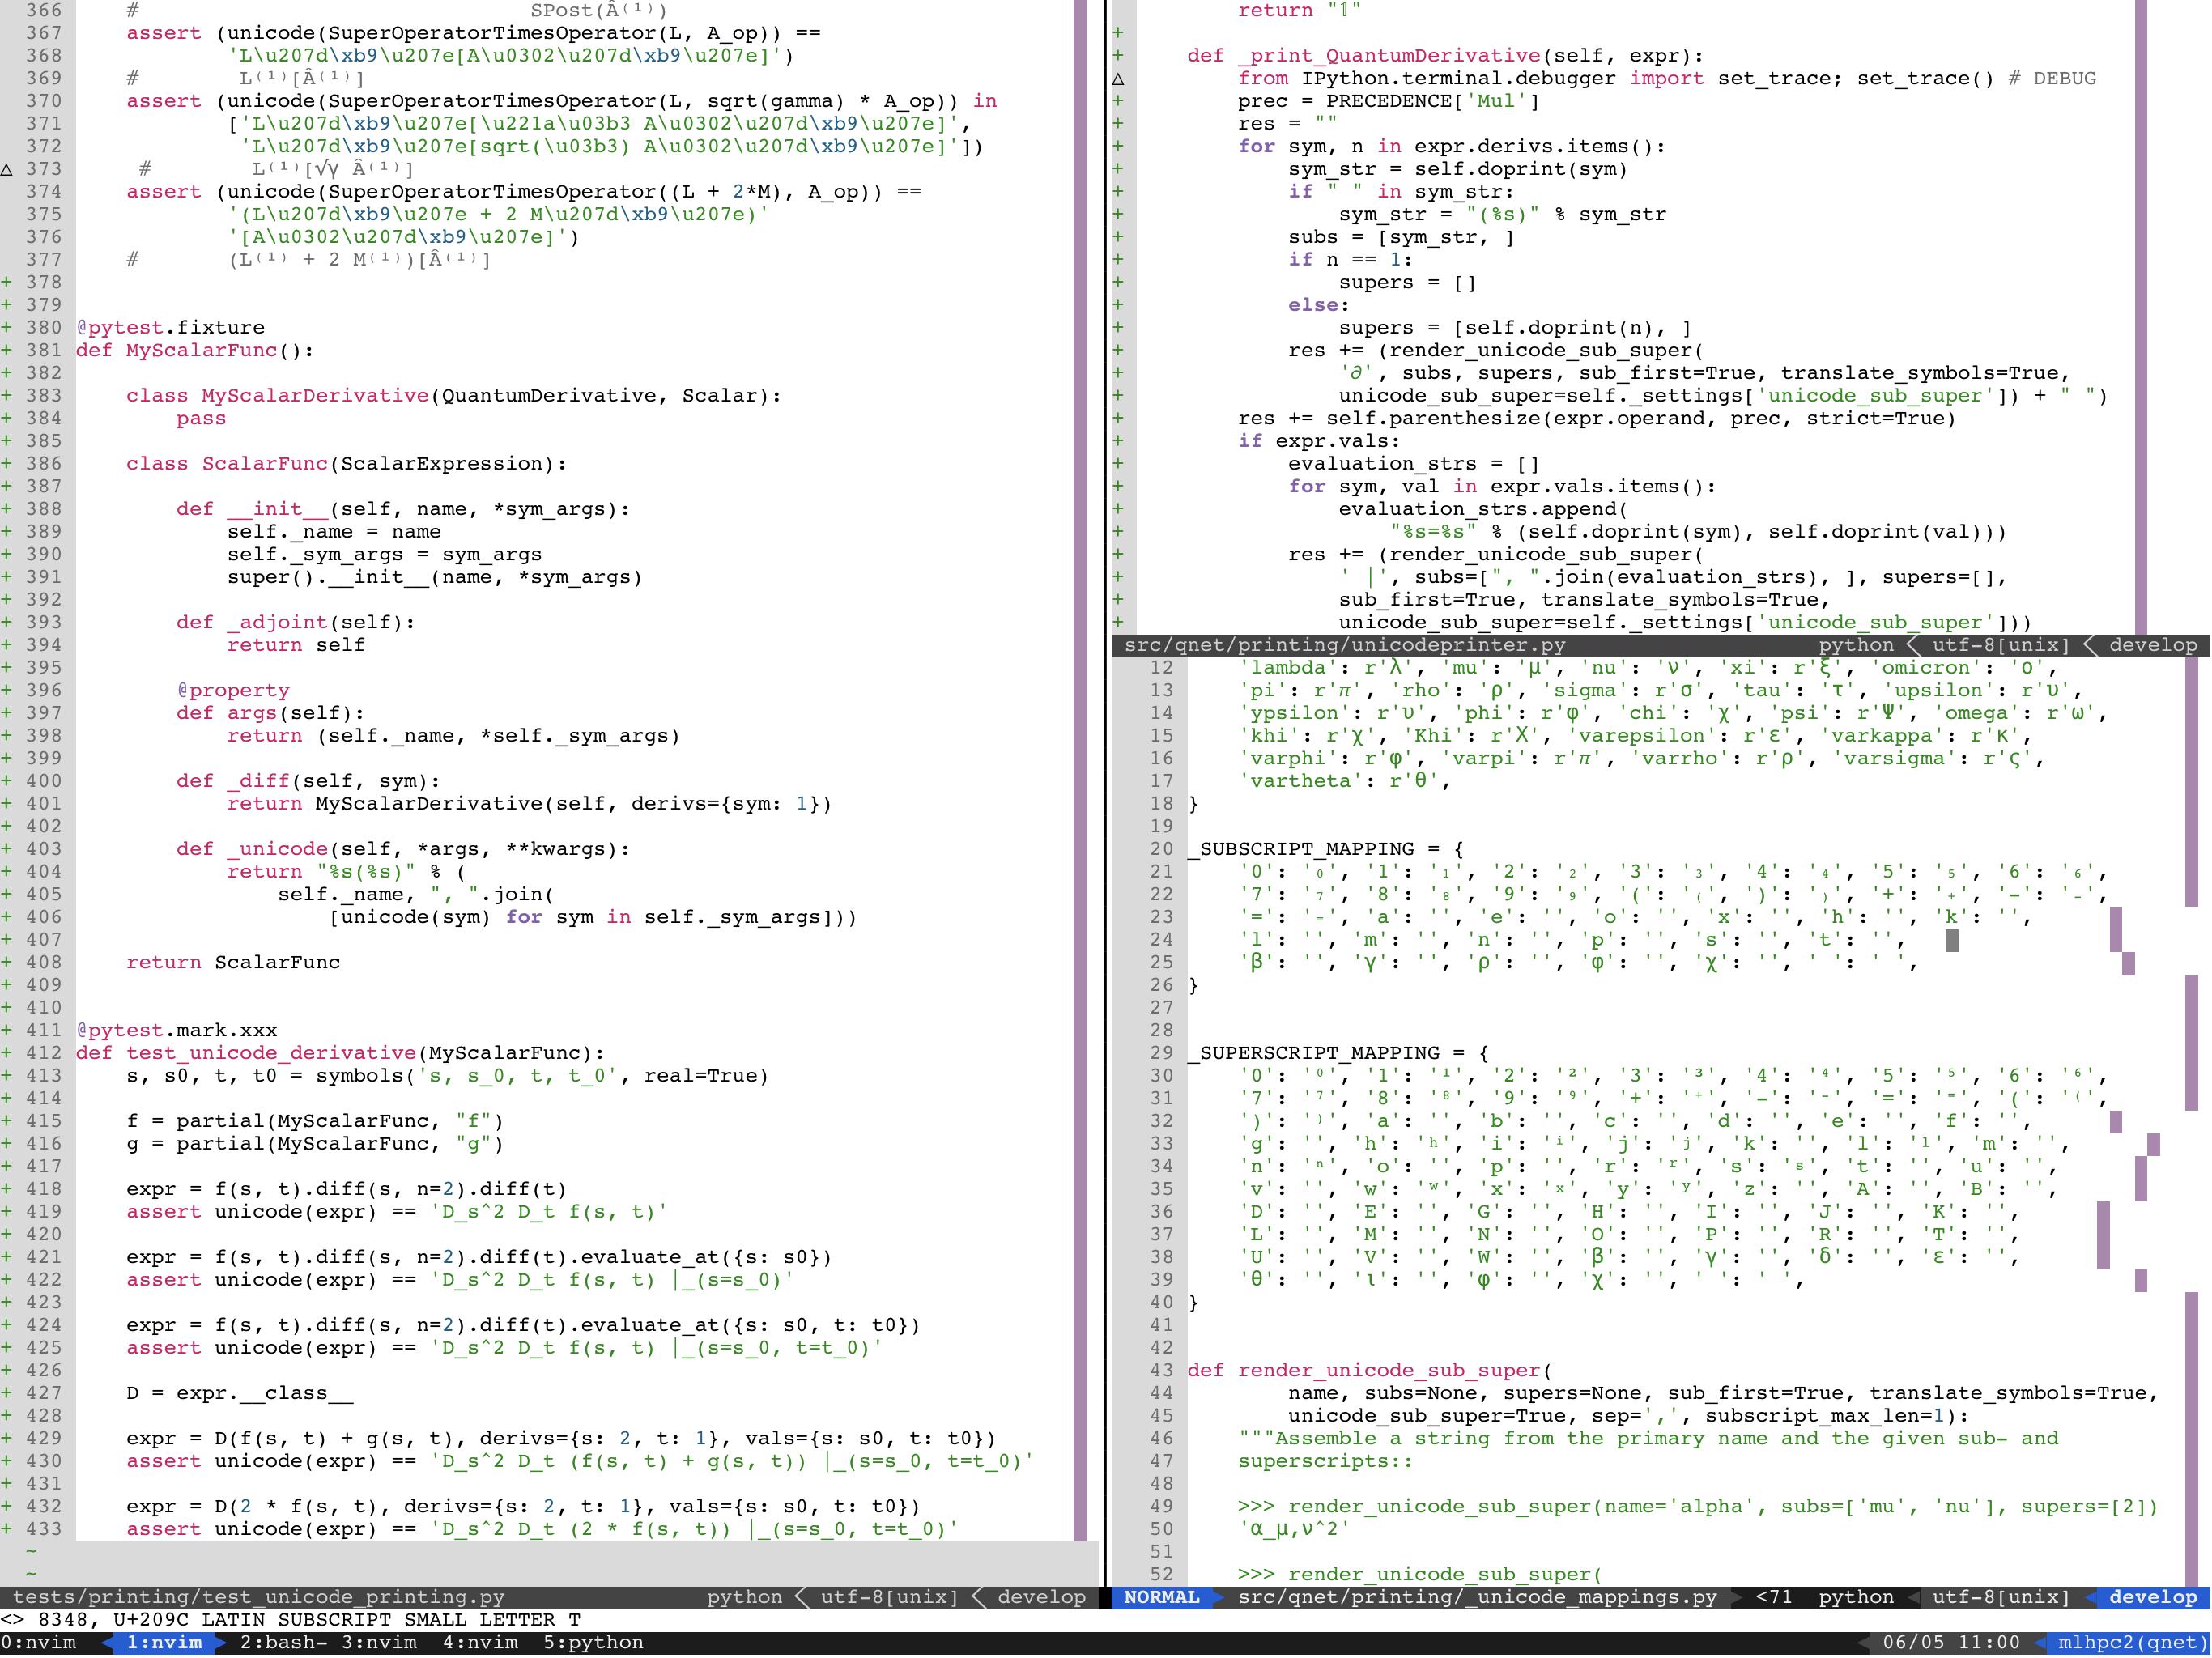 Broken unicode subscripts, unusable mosh · Issue #524